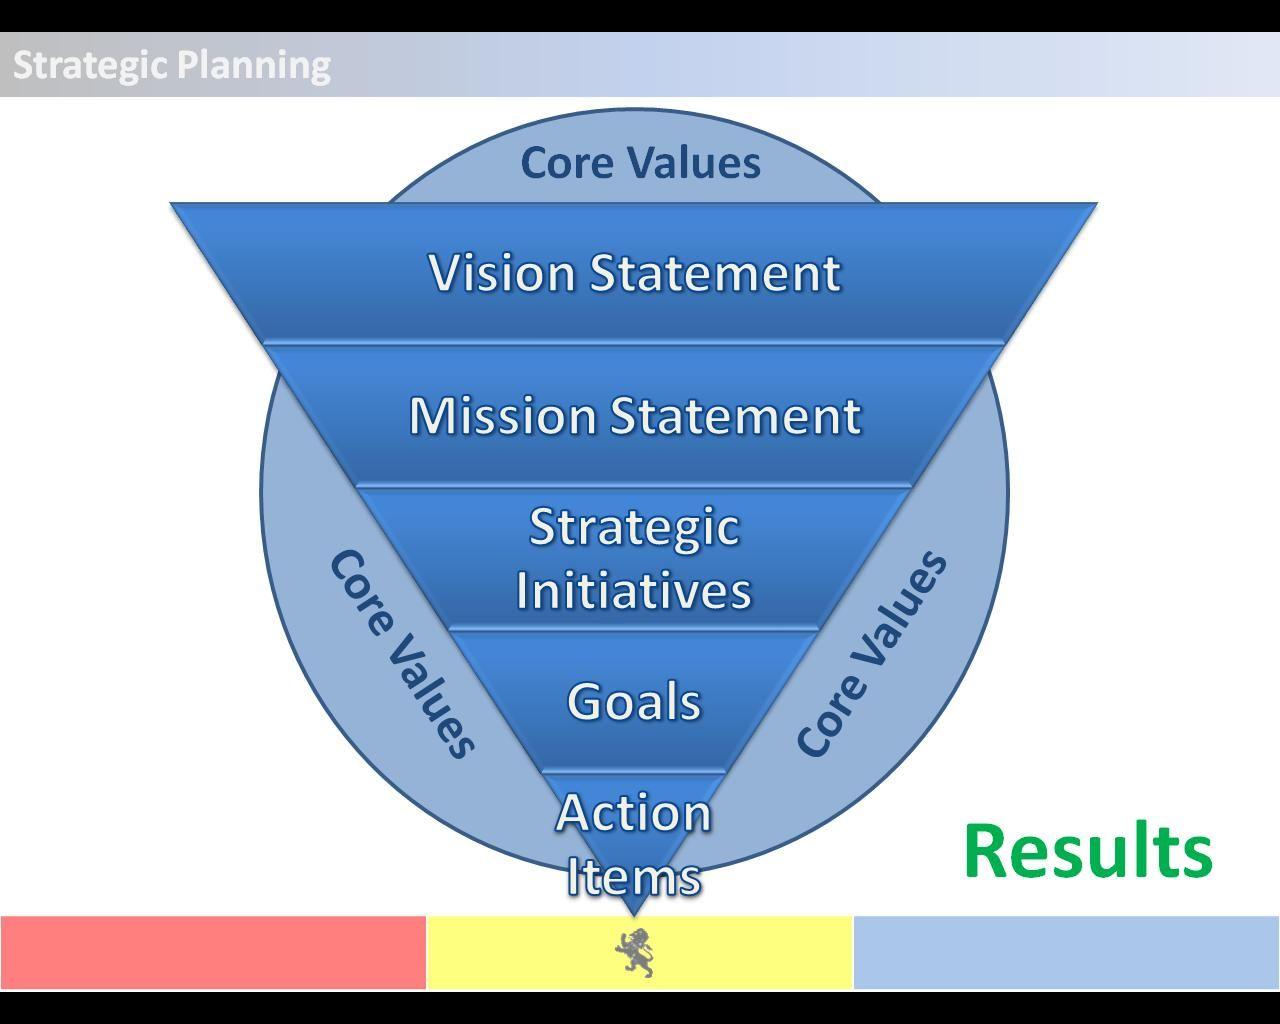 Strategic Planning Framework Pyramid With Images Strategic